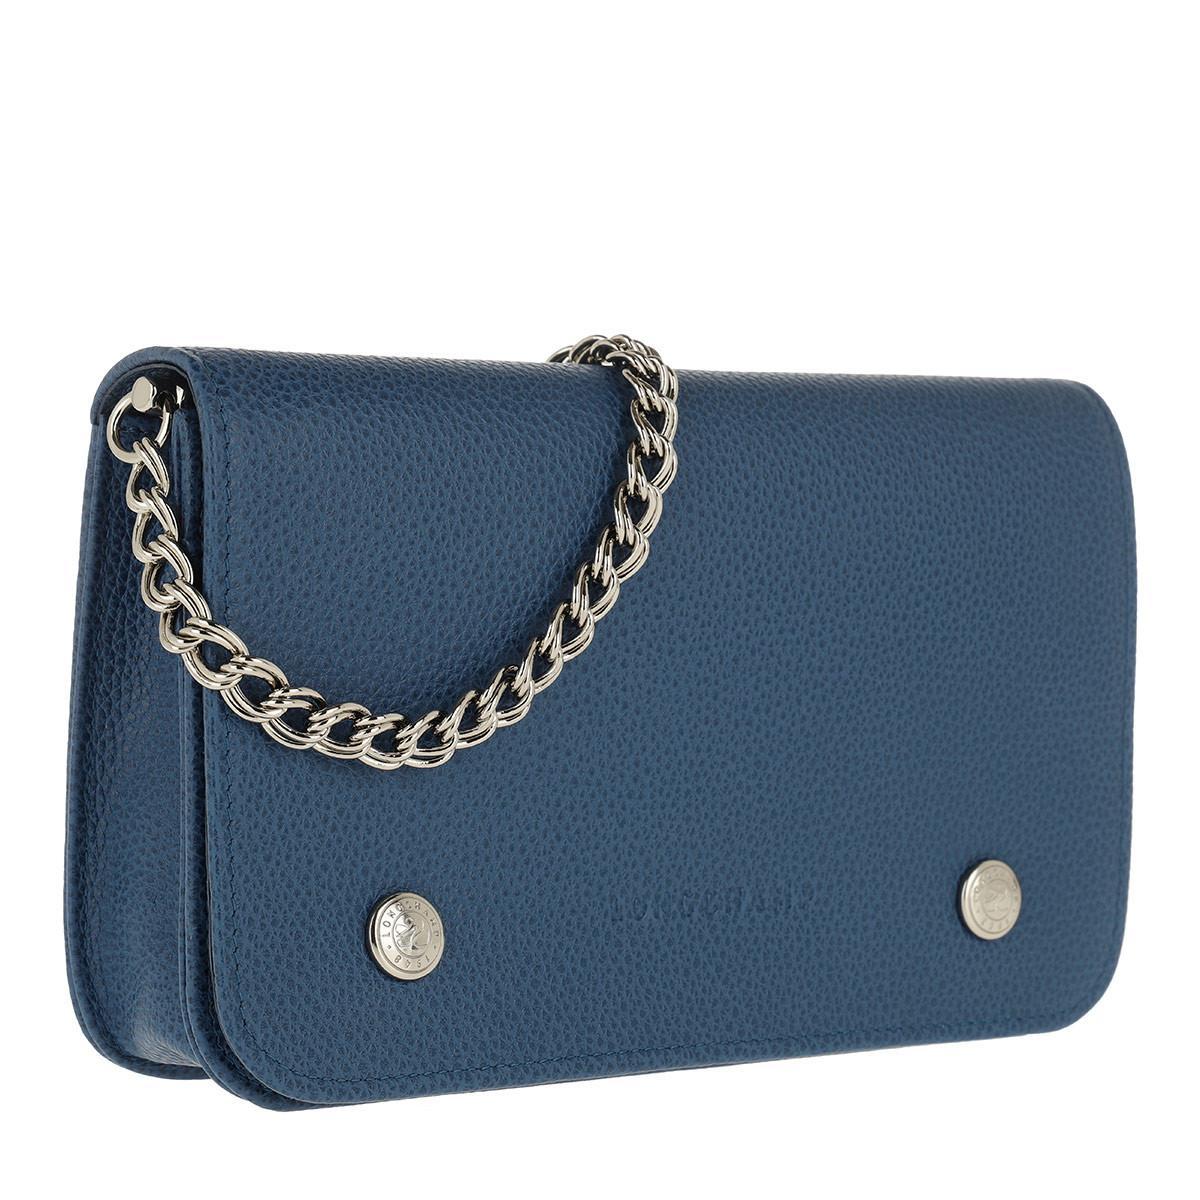 56b2dab80611 Longchamp - Blue Le Foulonné Wallet On Chain Leather Sapphire - Lyst. View  fullscreen